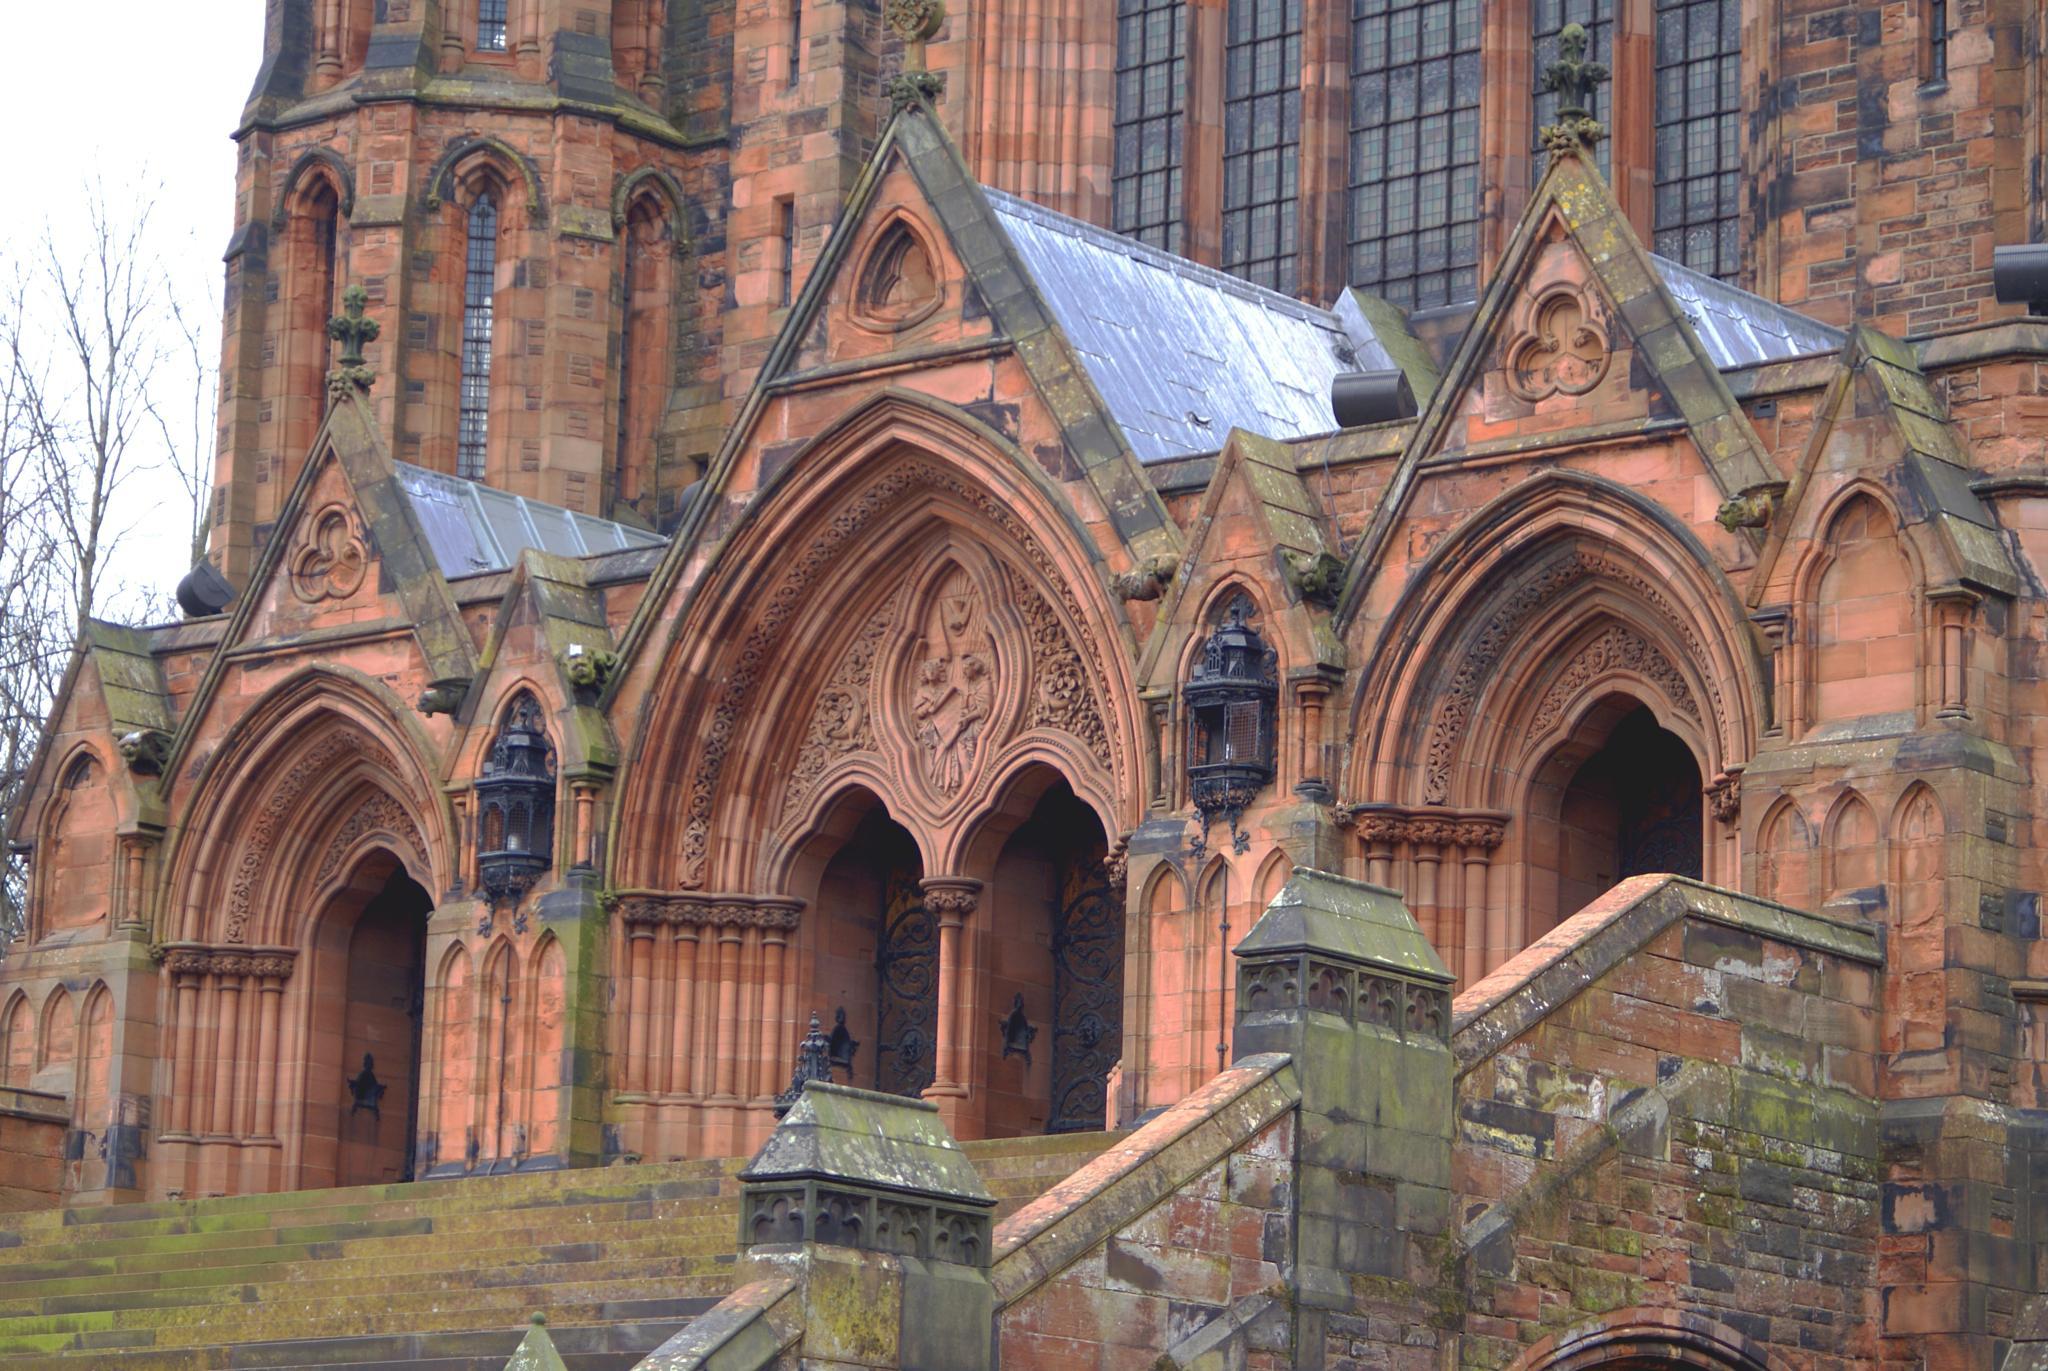 church 2 by graham.drew.90